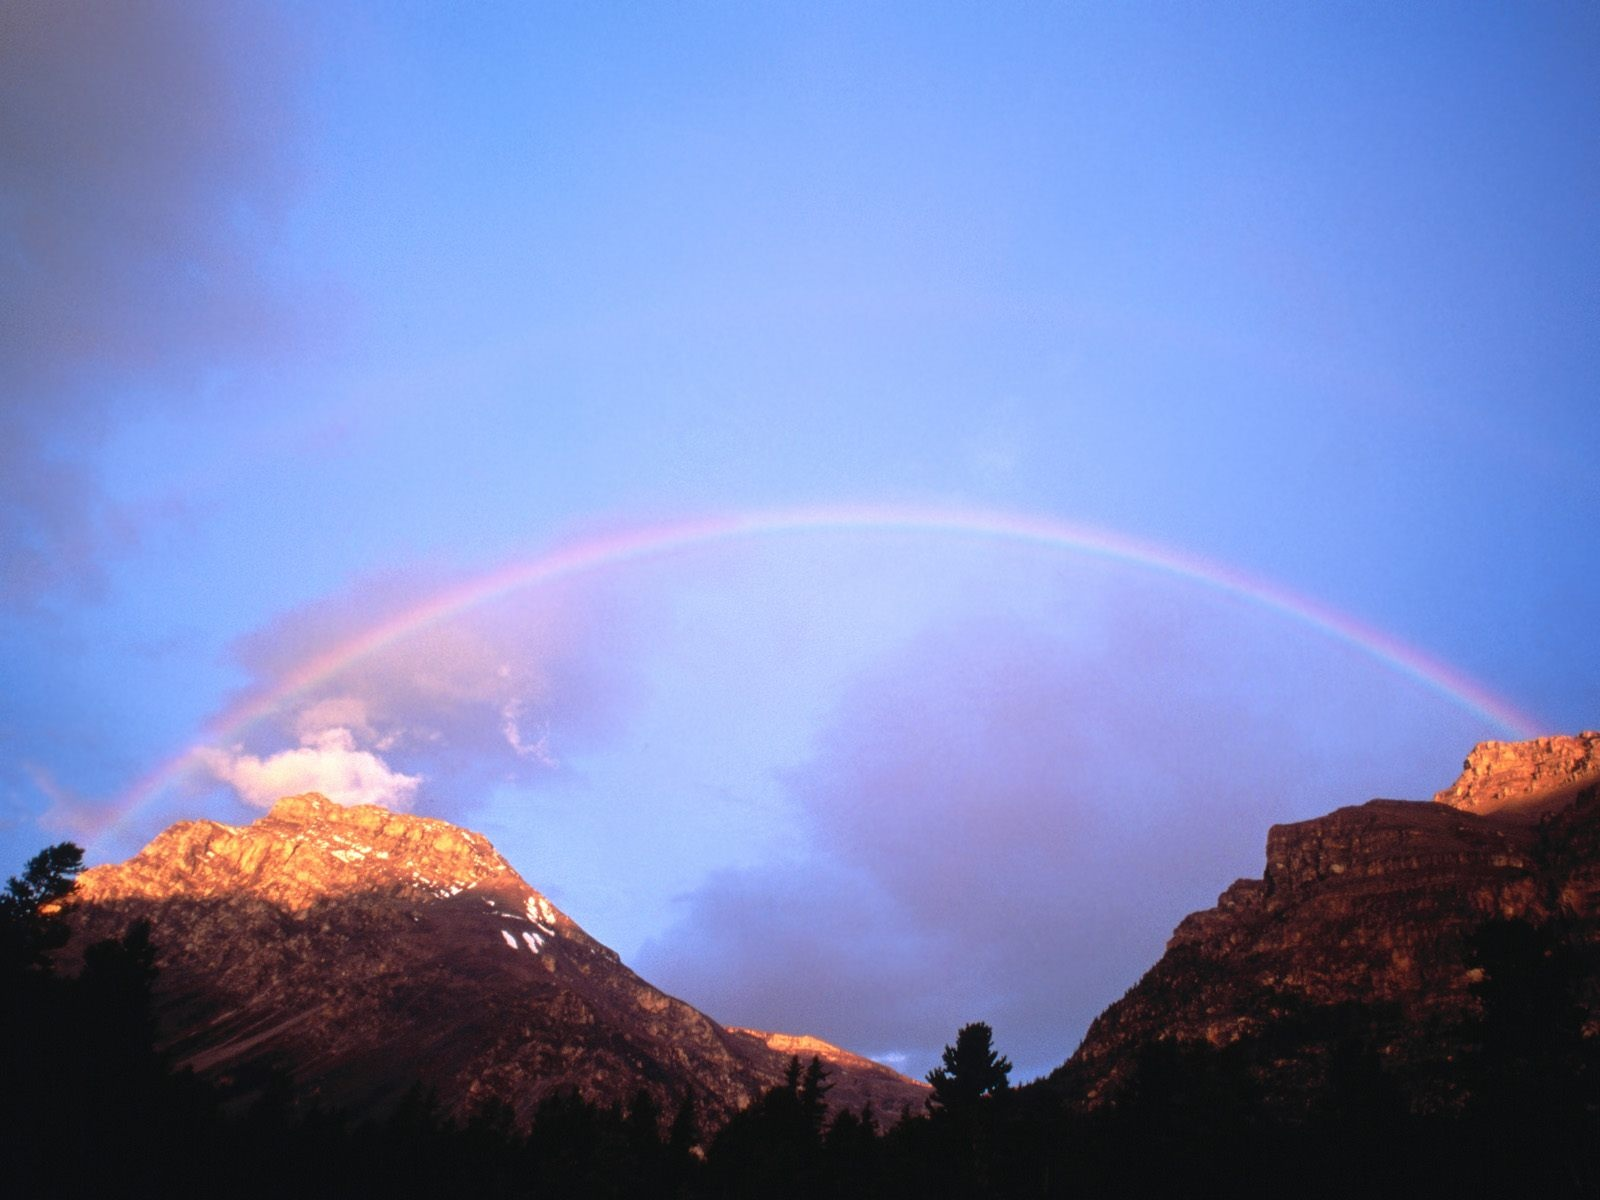 Rainbow - Hd Wallpapers 1600x1200